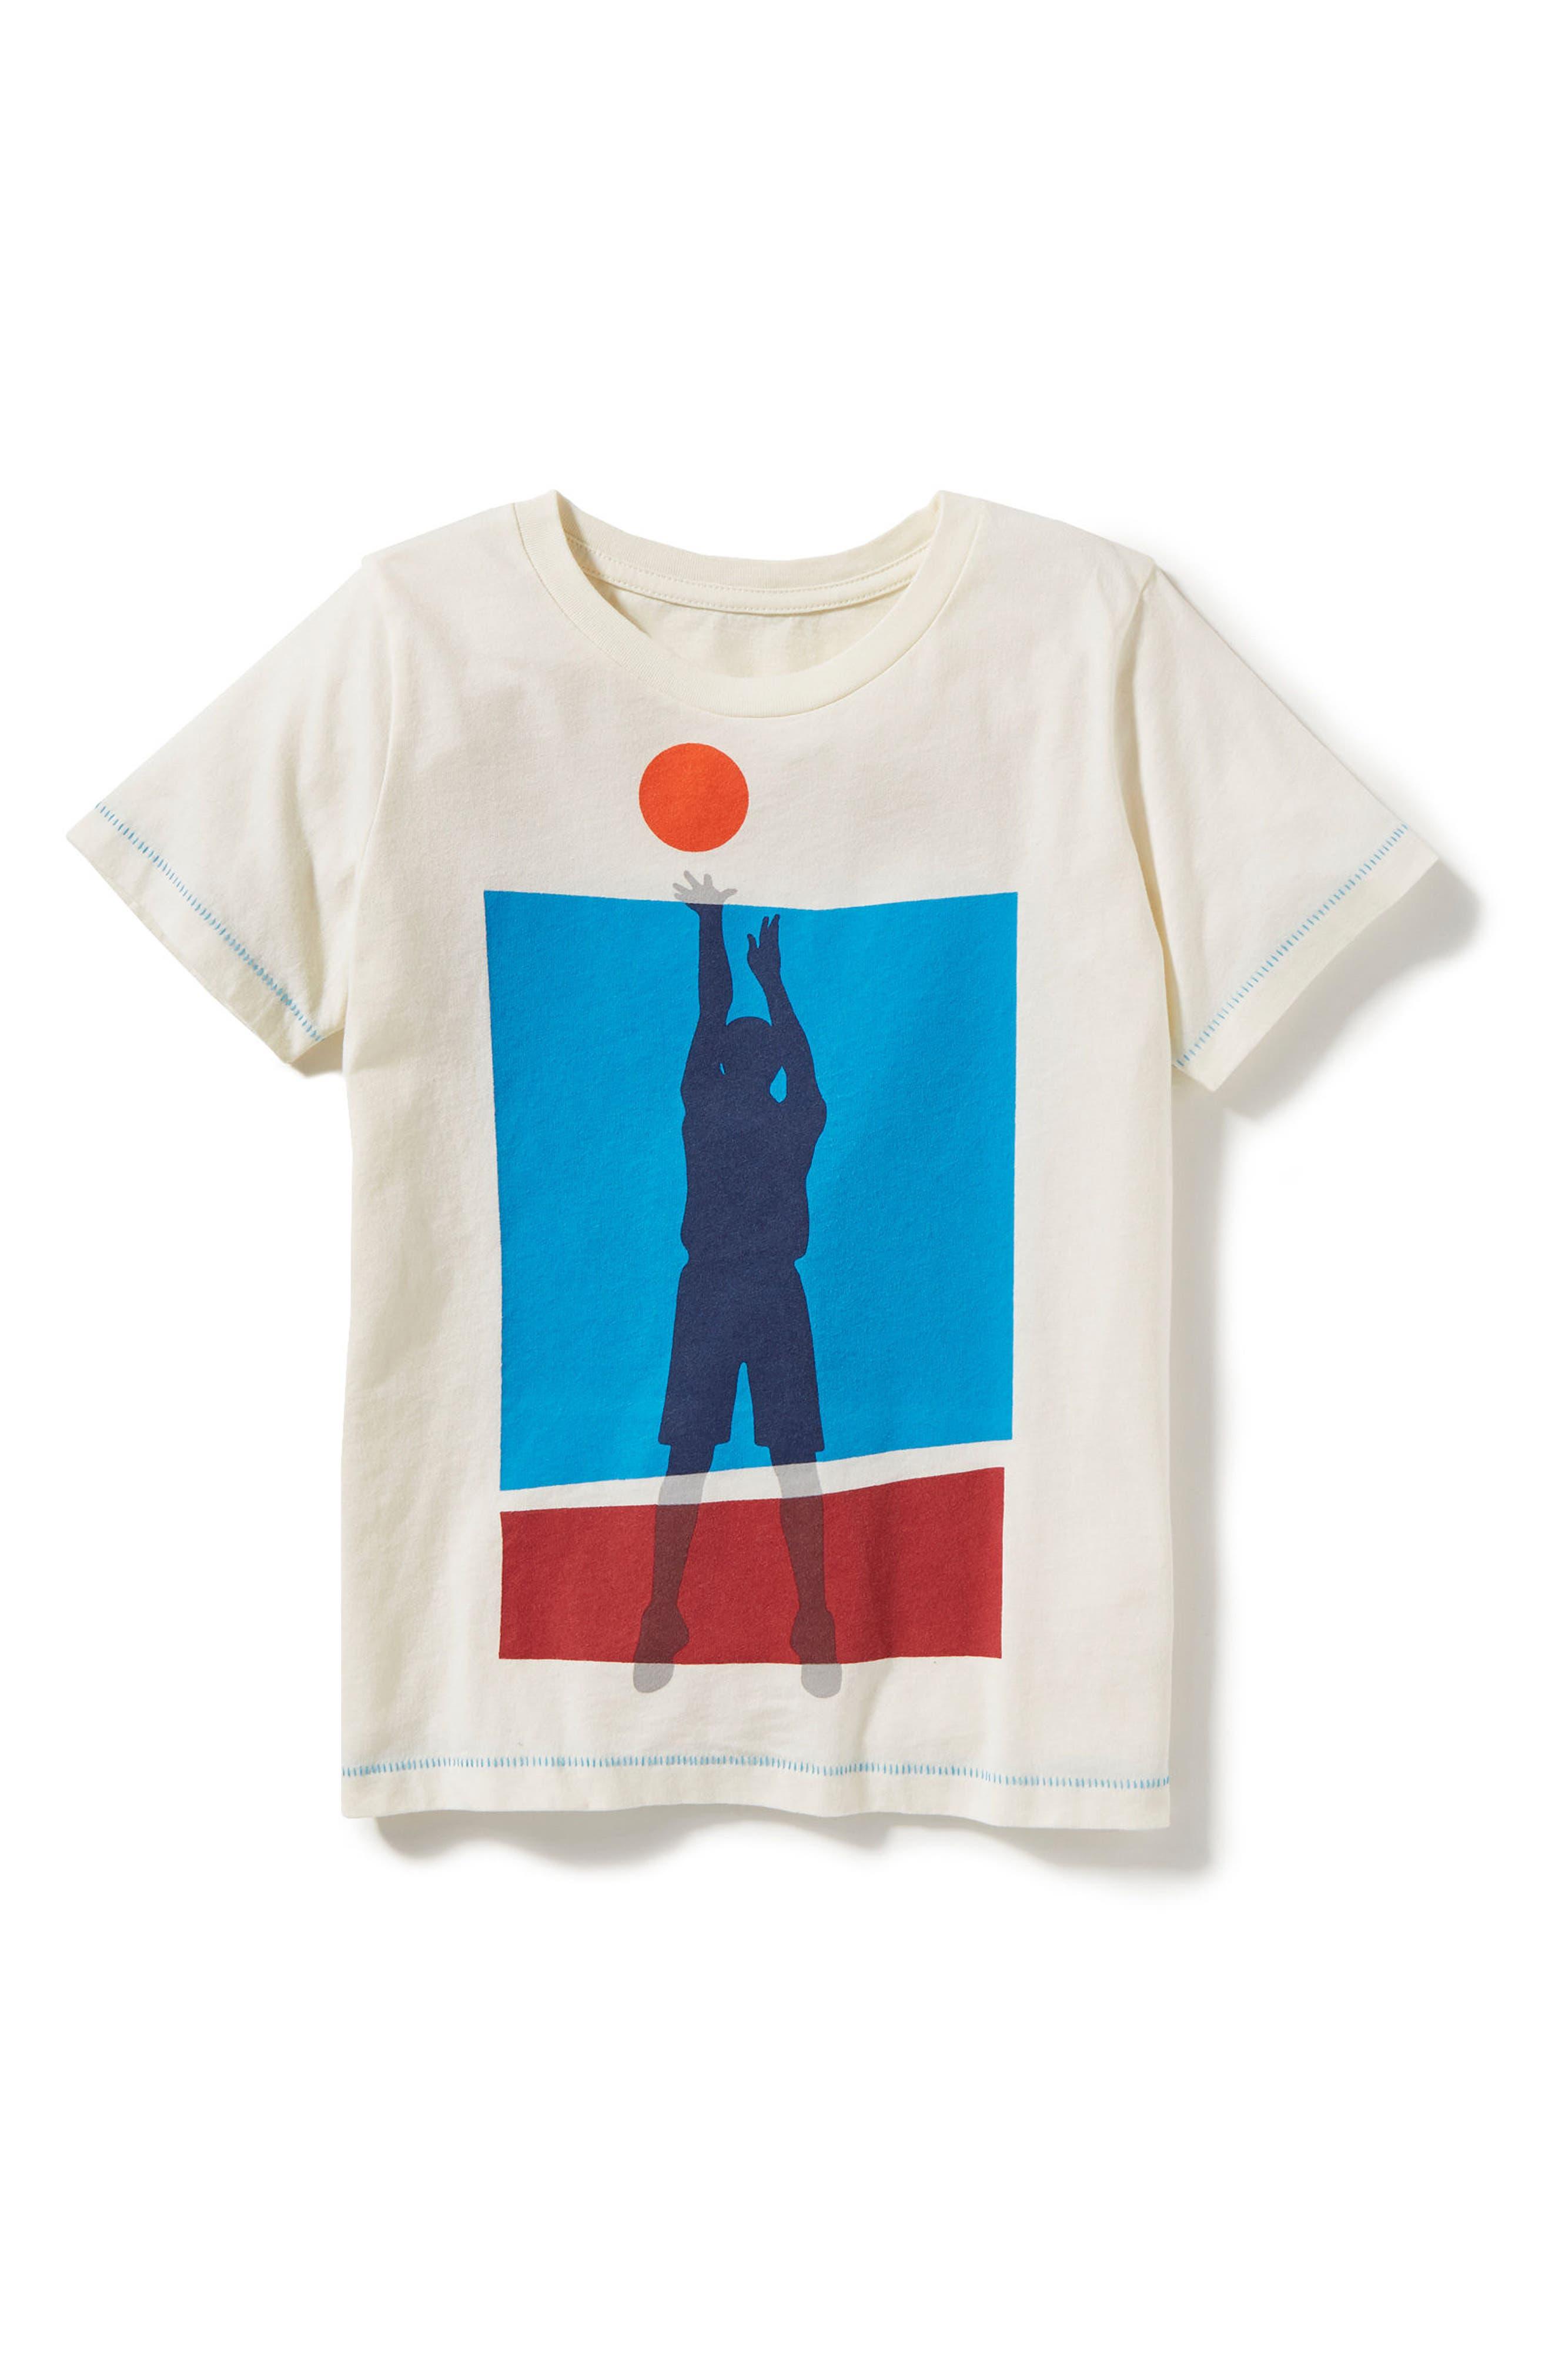 Basketball Practice T-Shirt,                             Alternate thumbnail 3, color,                             906